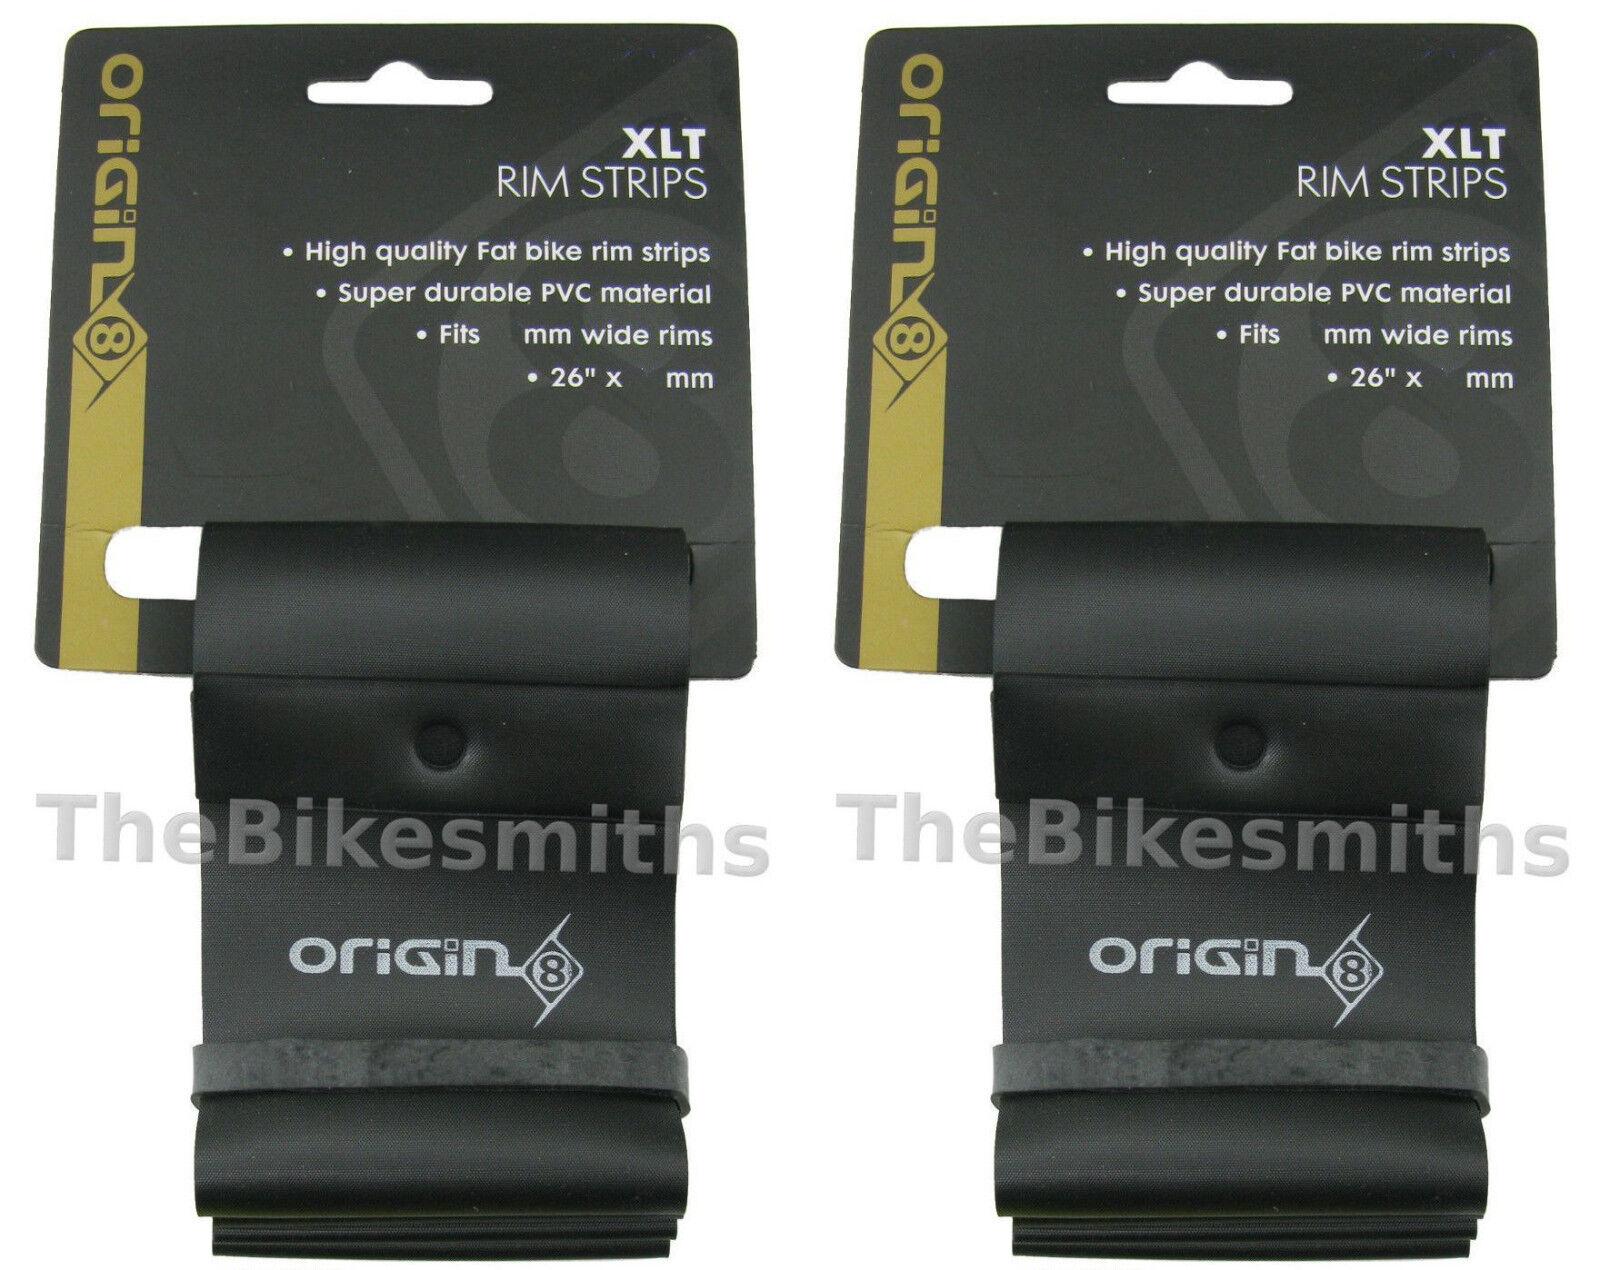 Origin8 Rim Strip At 26X64mm